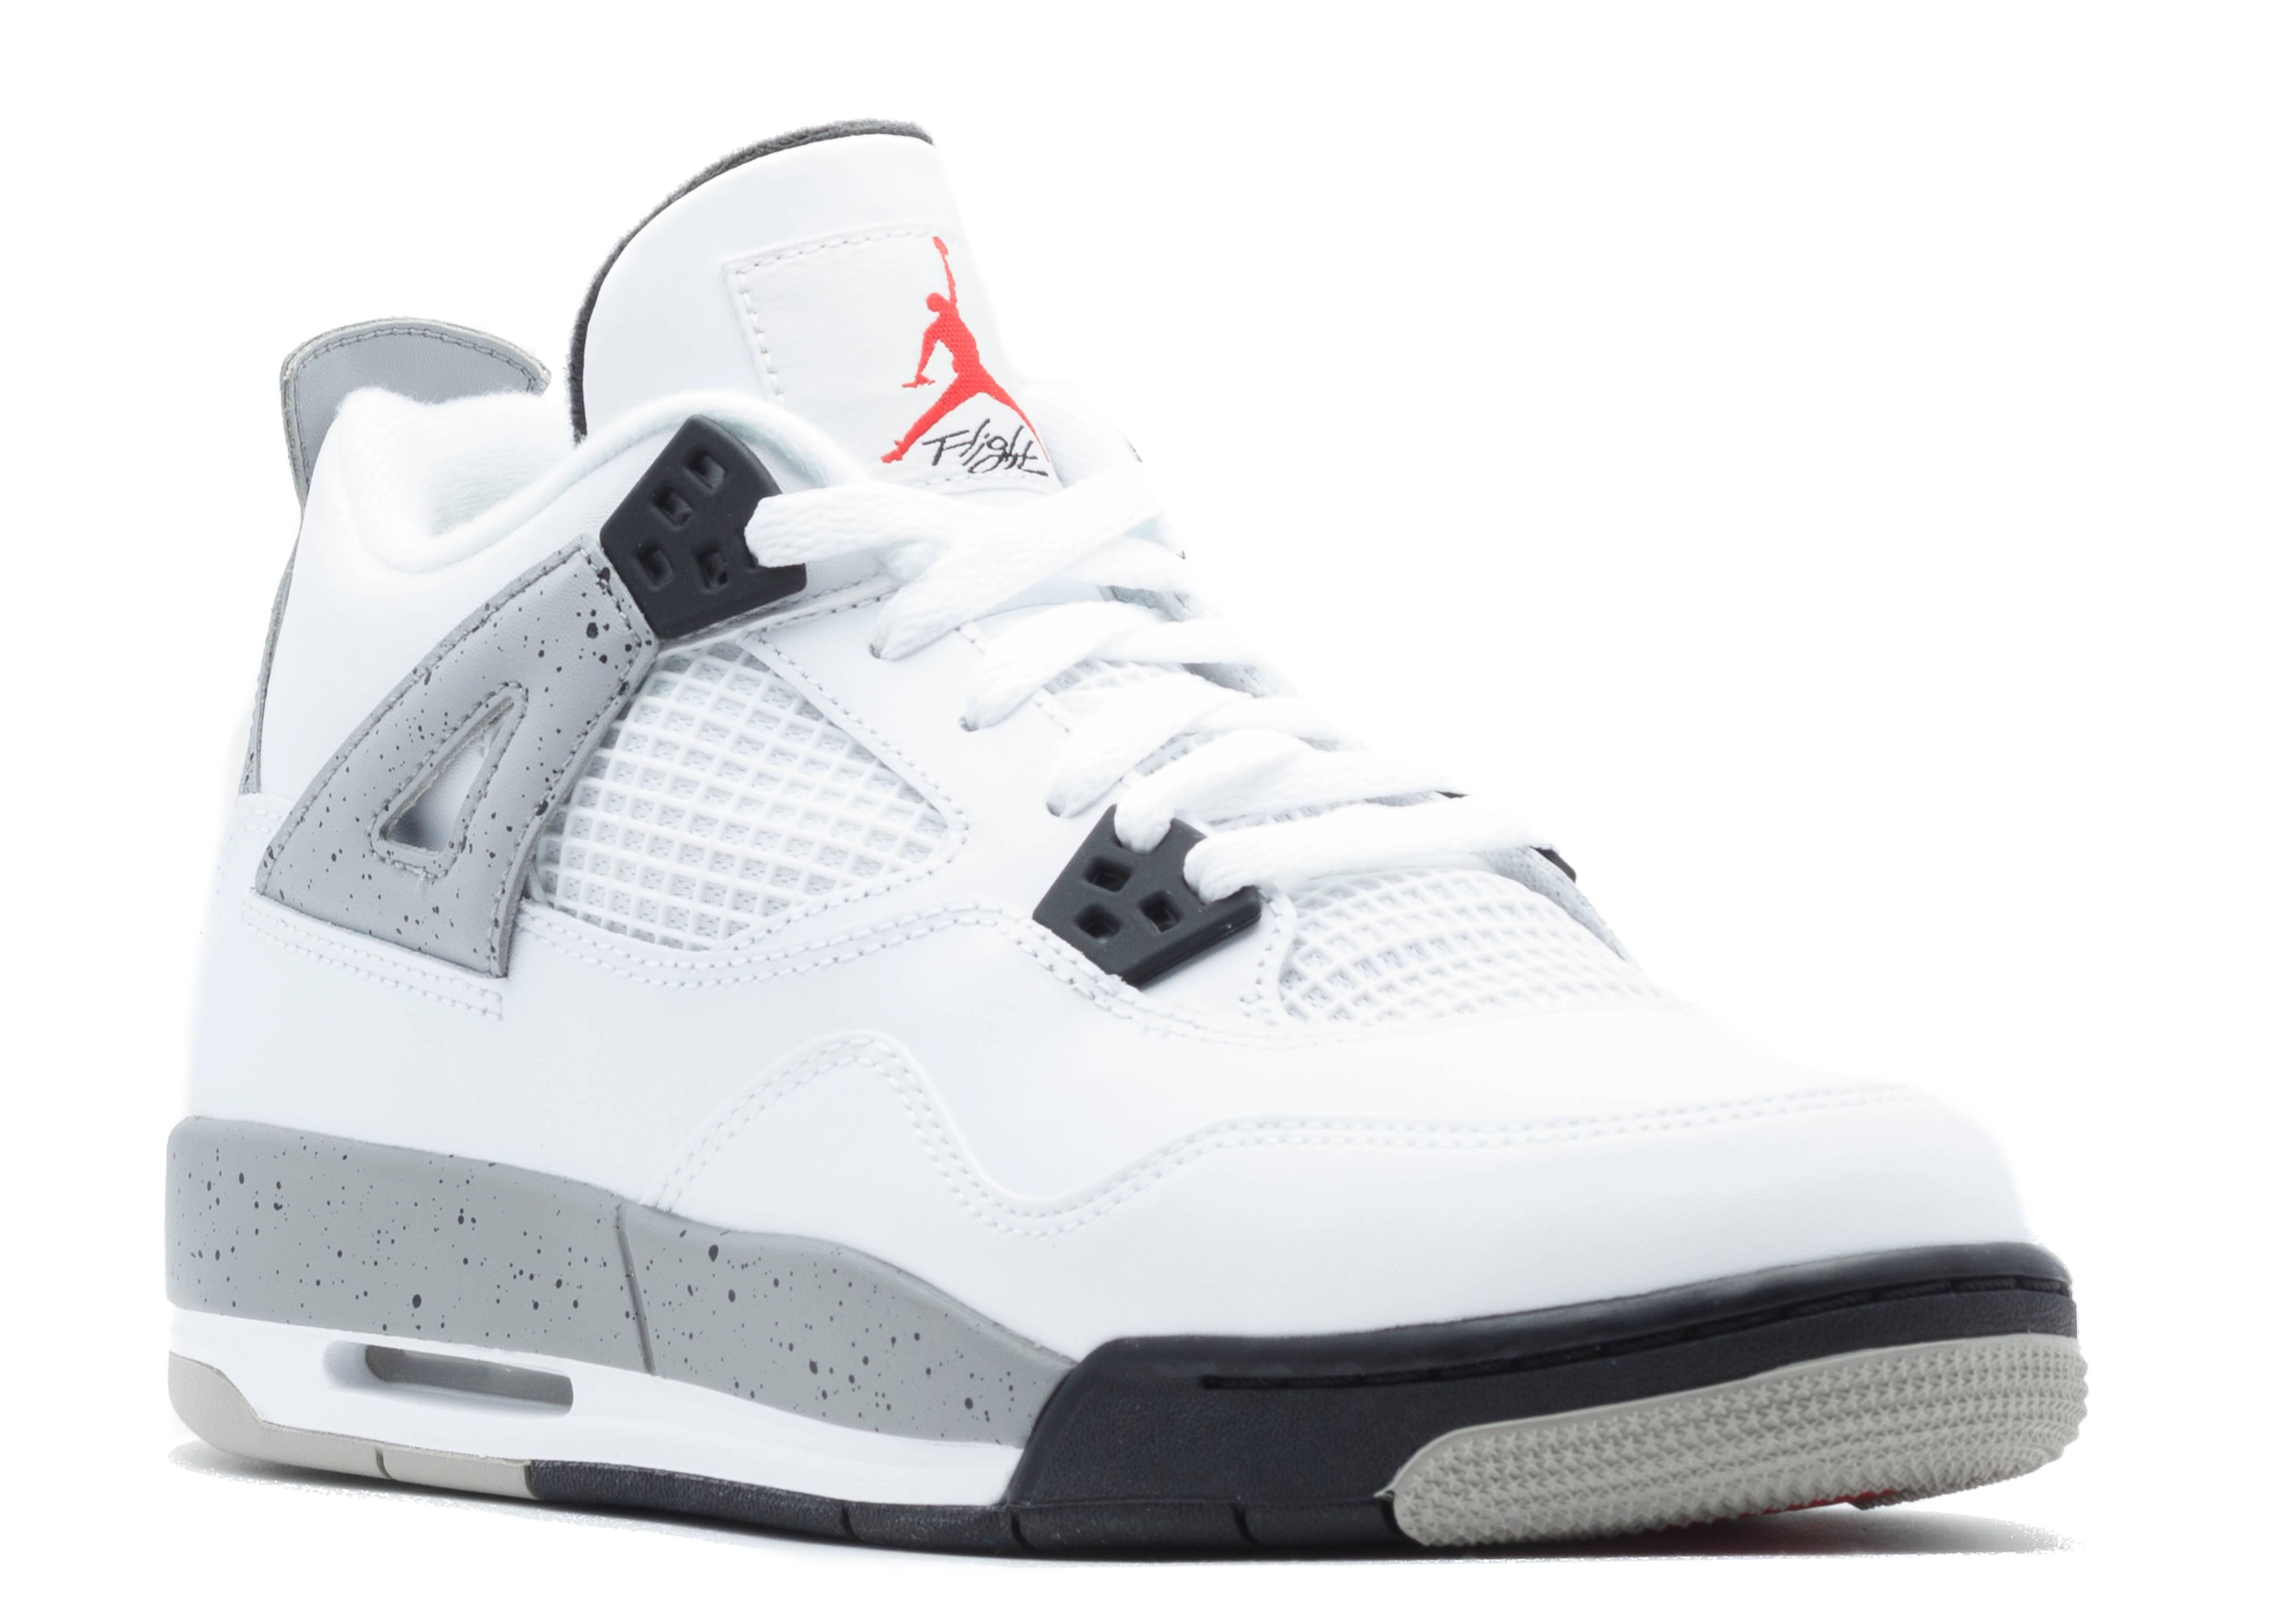 Air Jordan 4 Retro White Cement